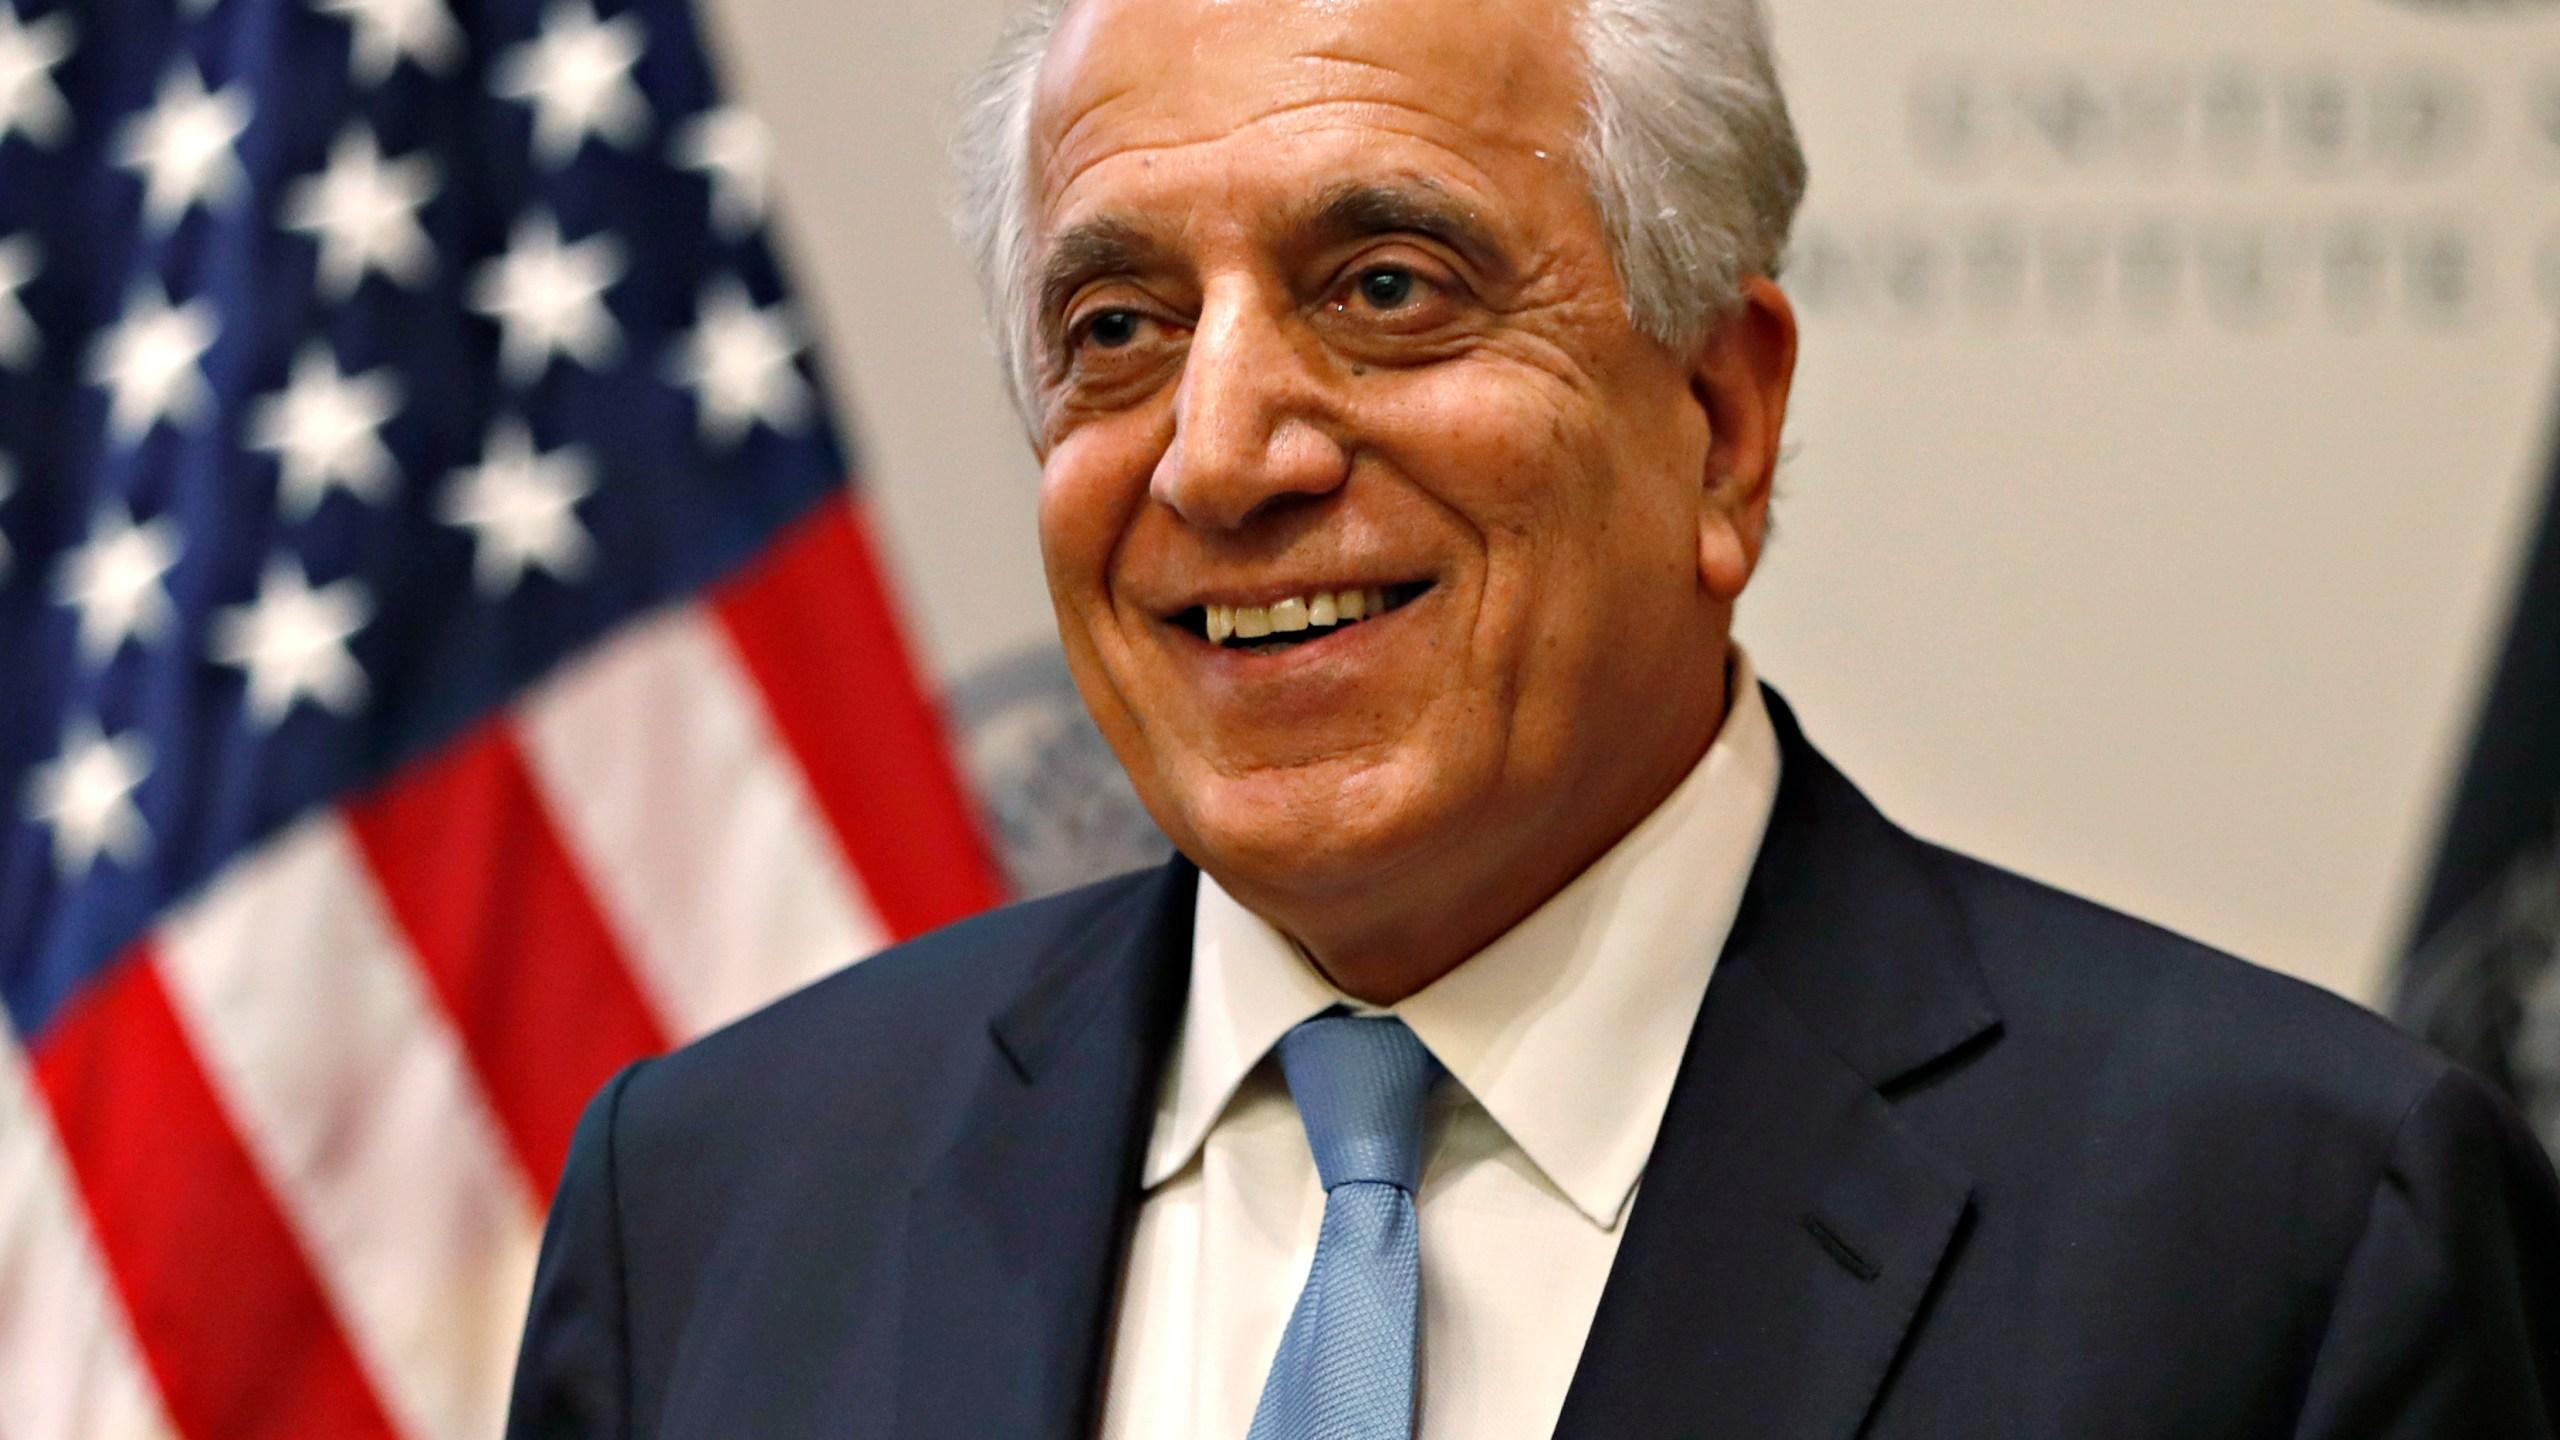 Zalmay Khalilzad